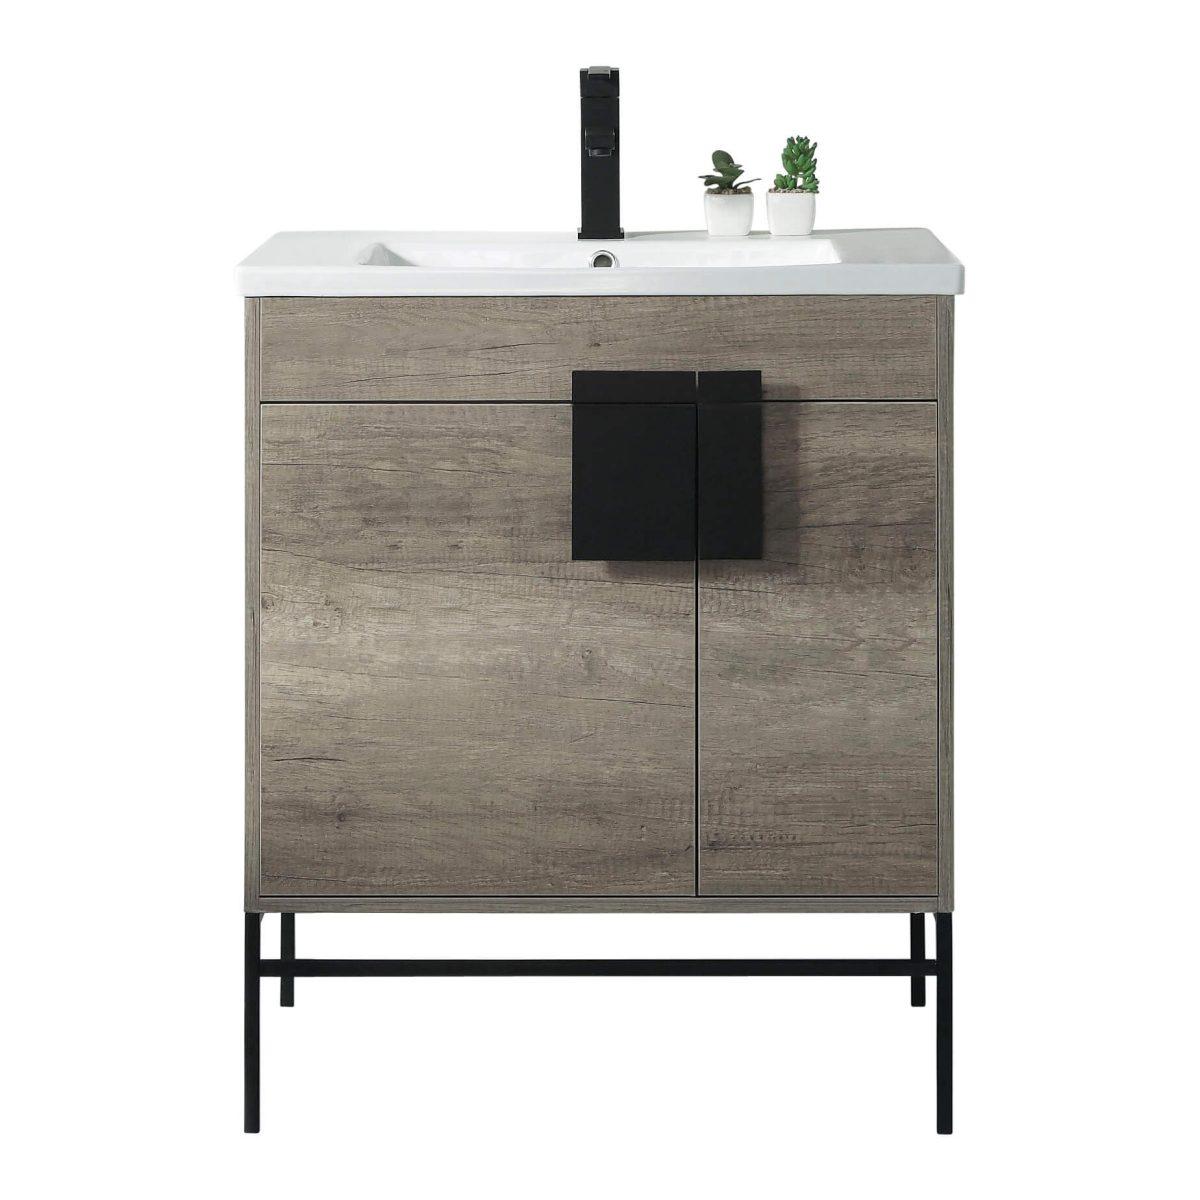 "Shawbridge 30"" Modern Bathroom Vanity  Shadow Gray with Black Hardware"